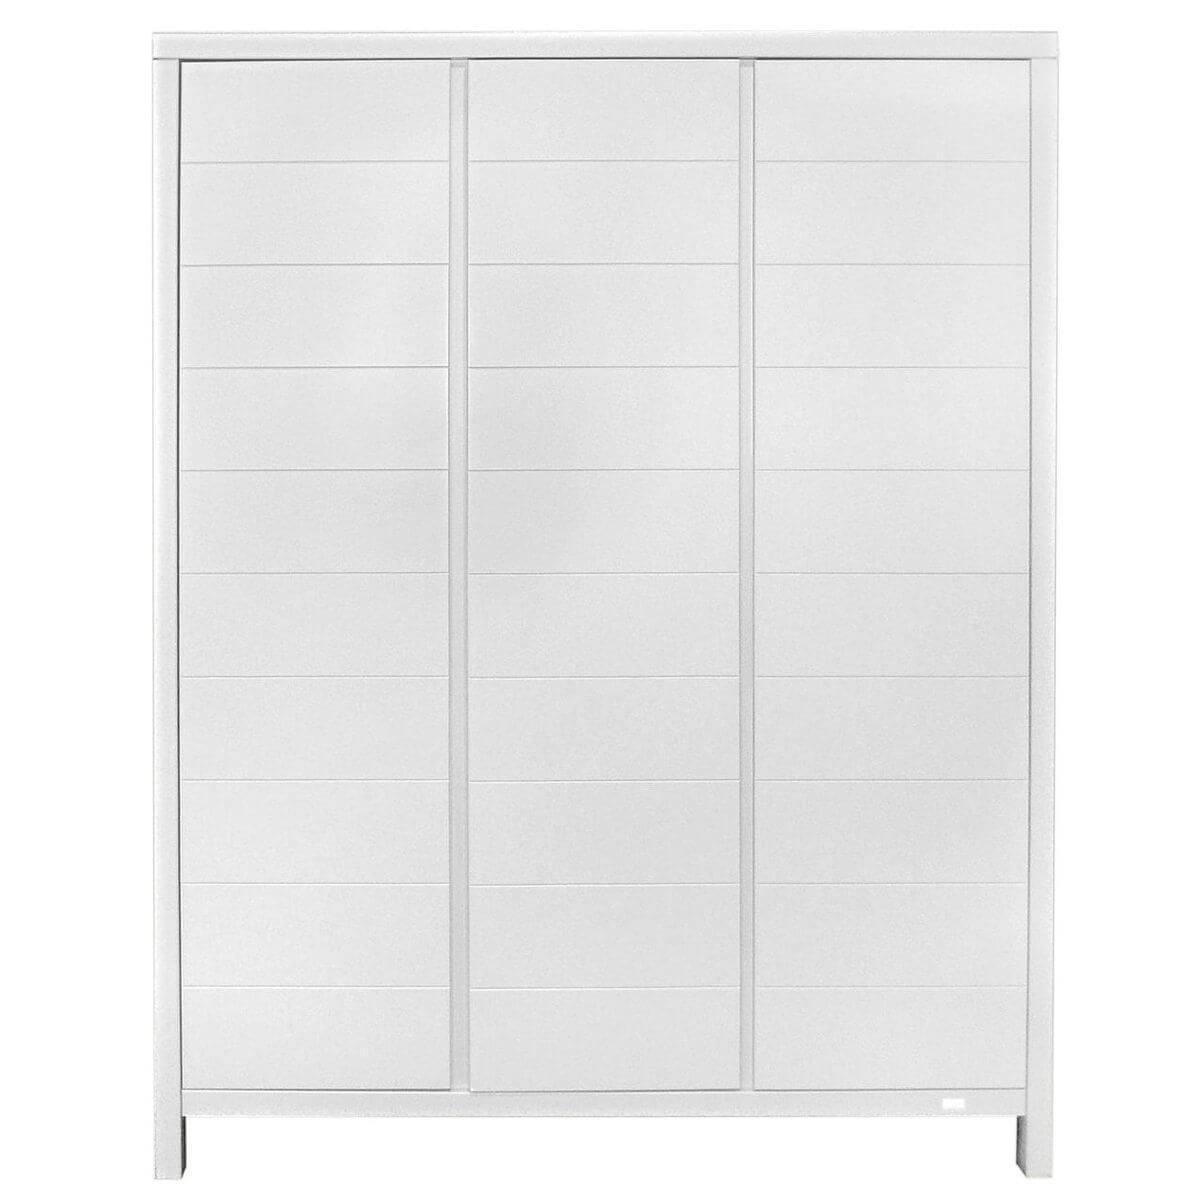 Armario 3 puertas STRIPES Quax blanco